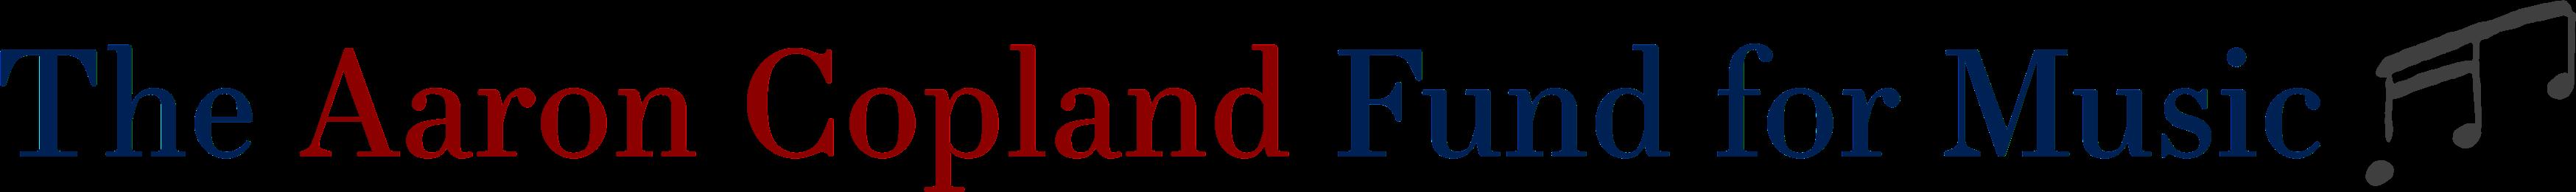 Aaron Copland Fund